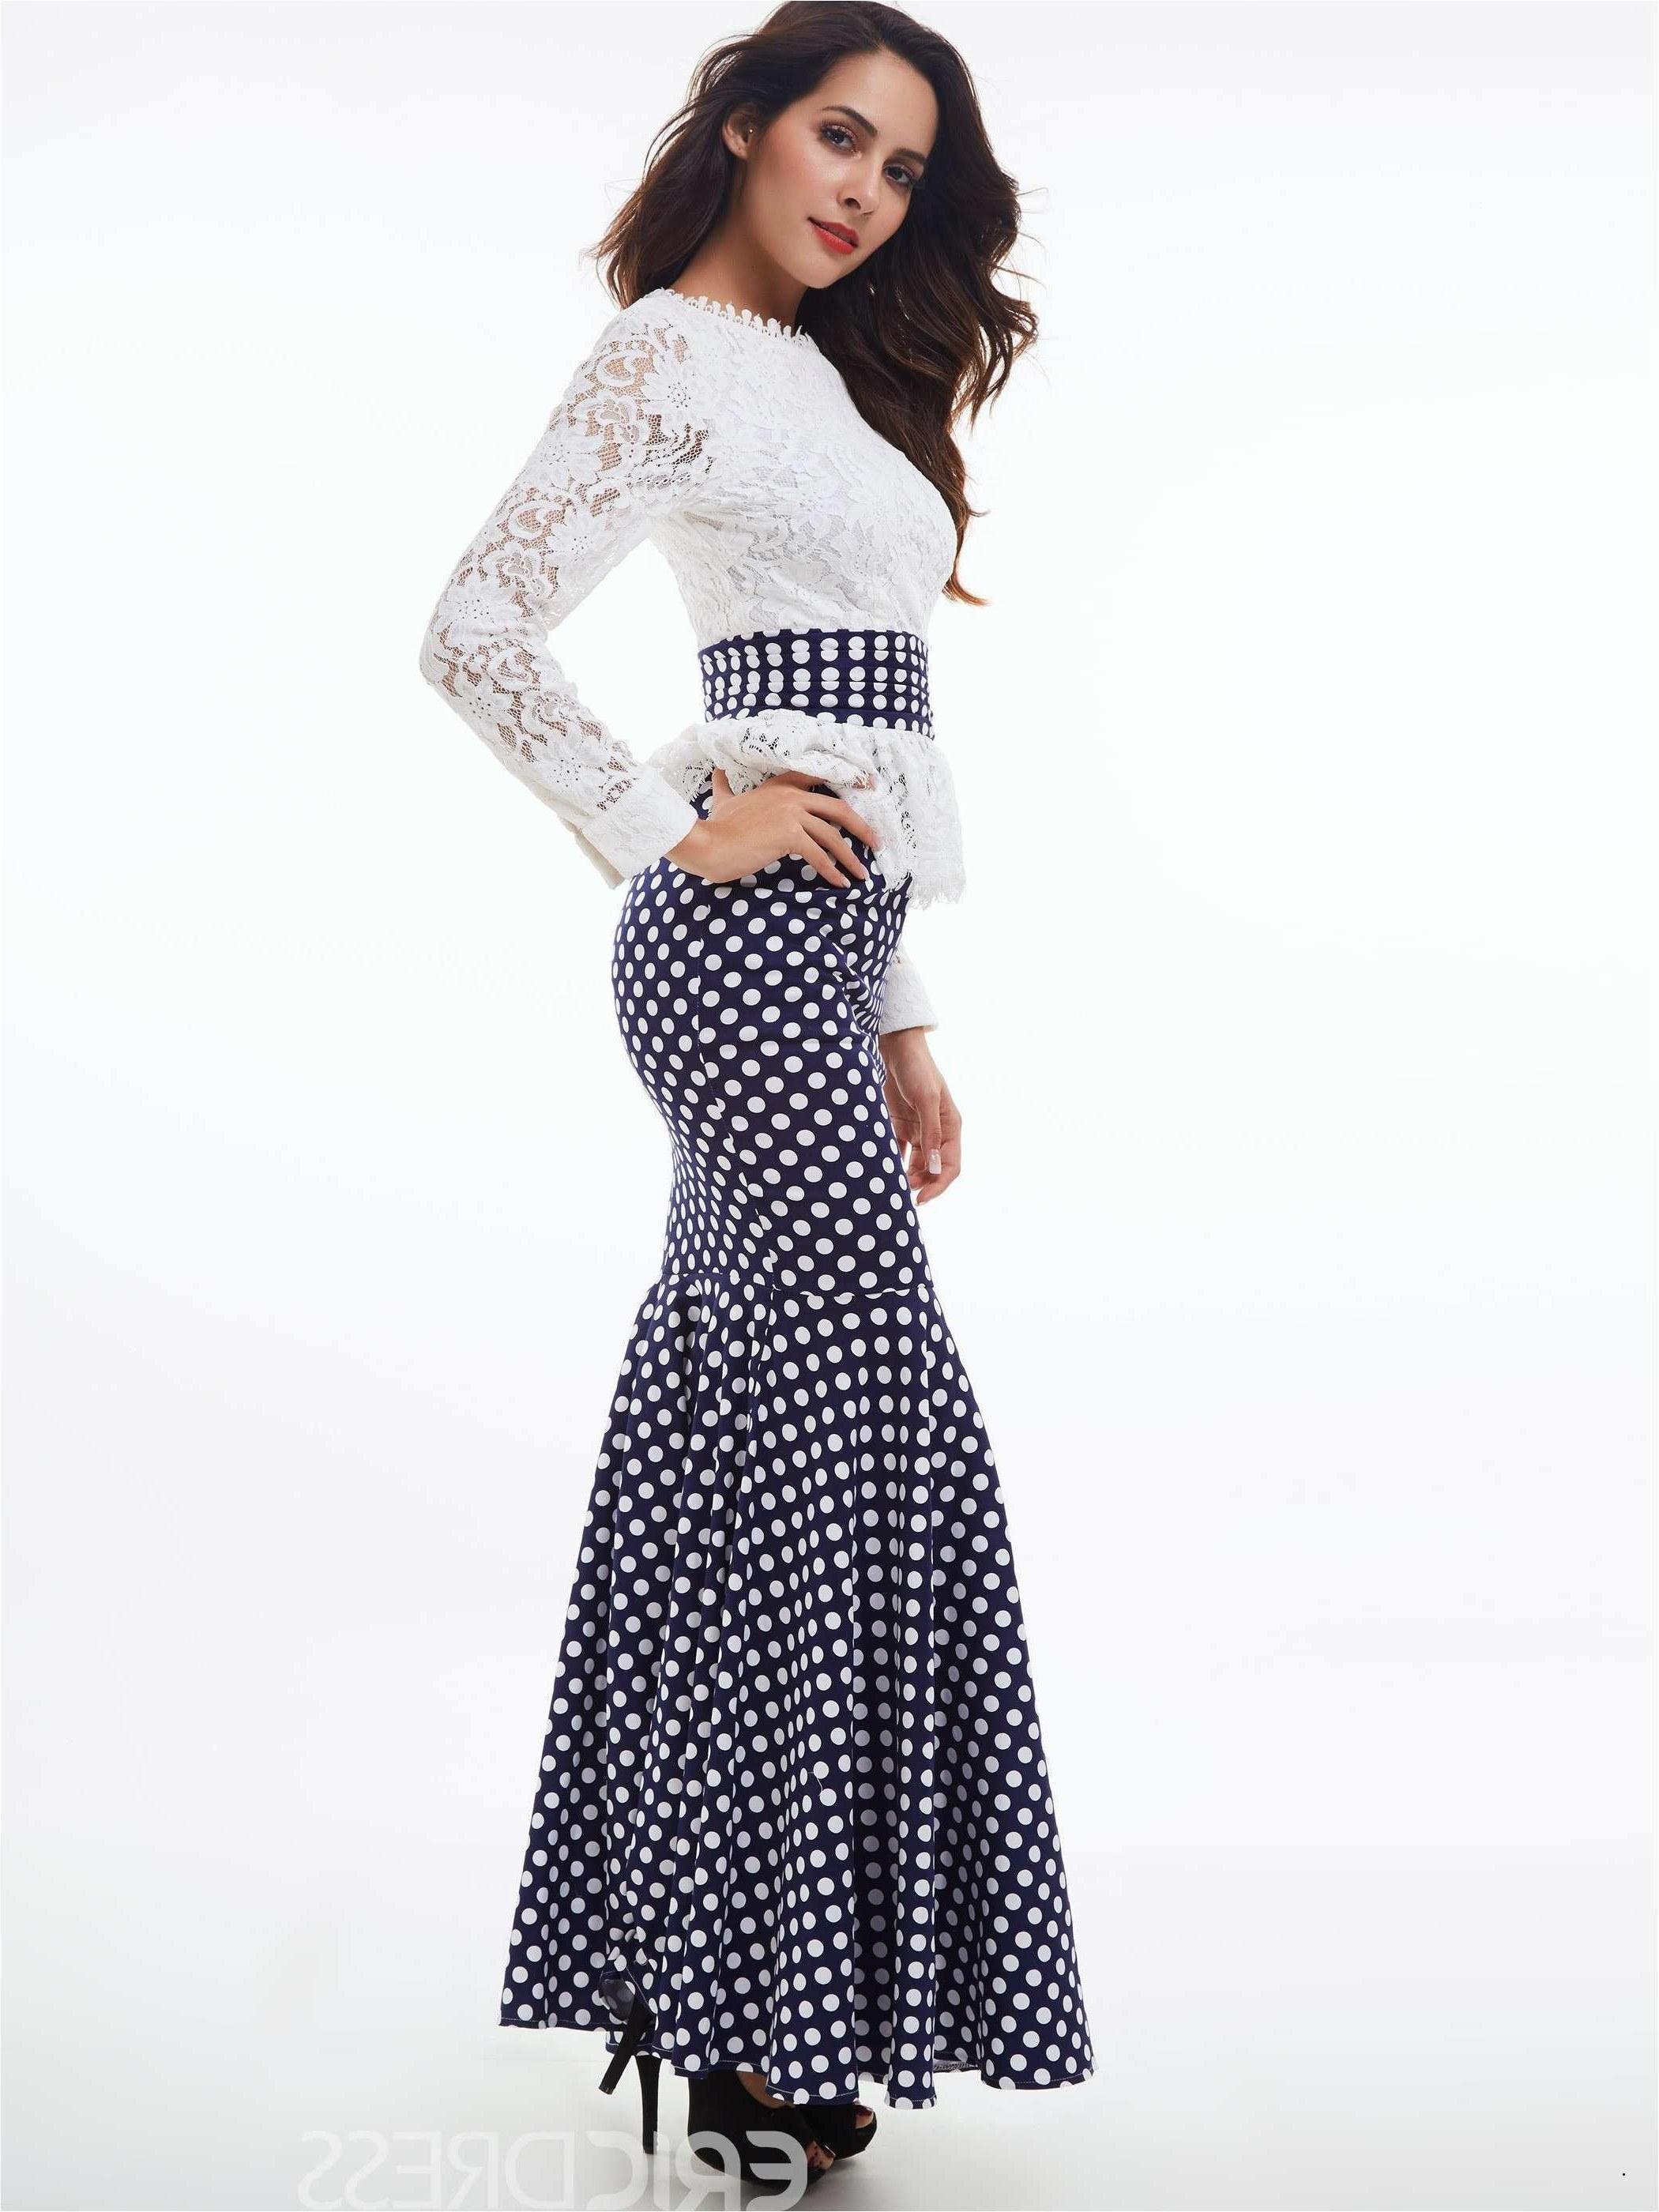 Inspirasi Model Baju Pengantin Muslim Zwdg Ecehispanic